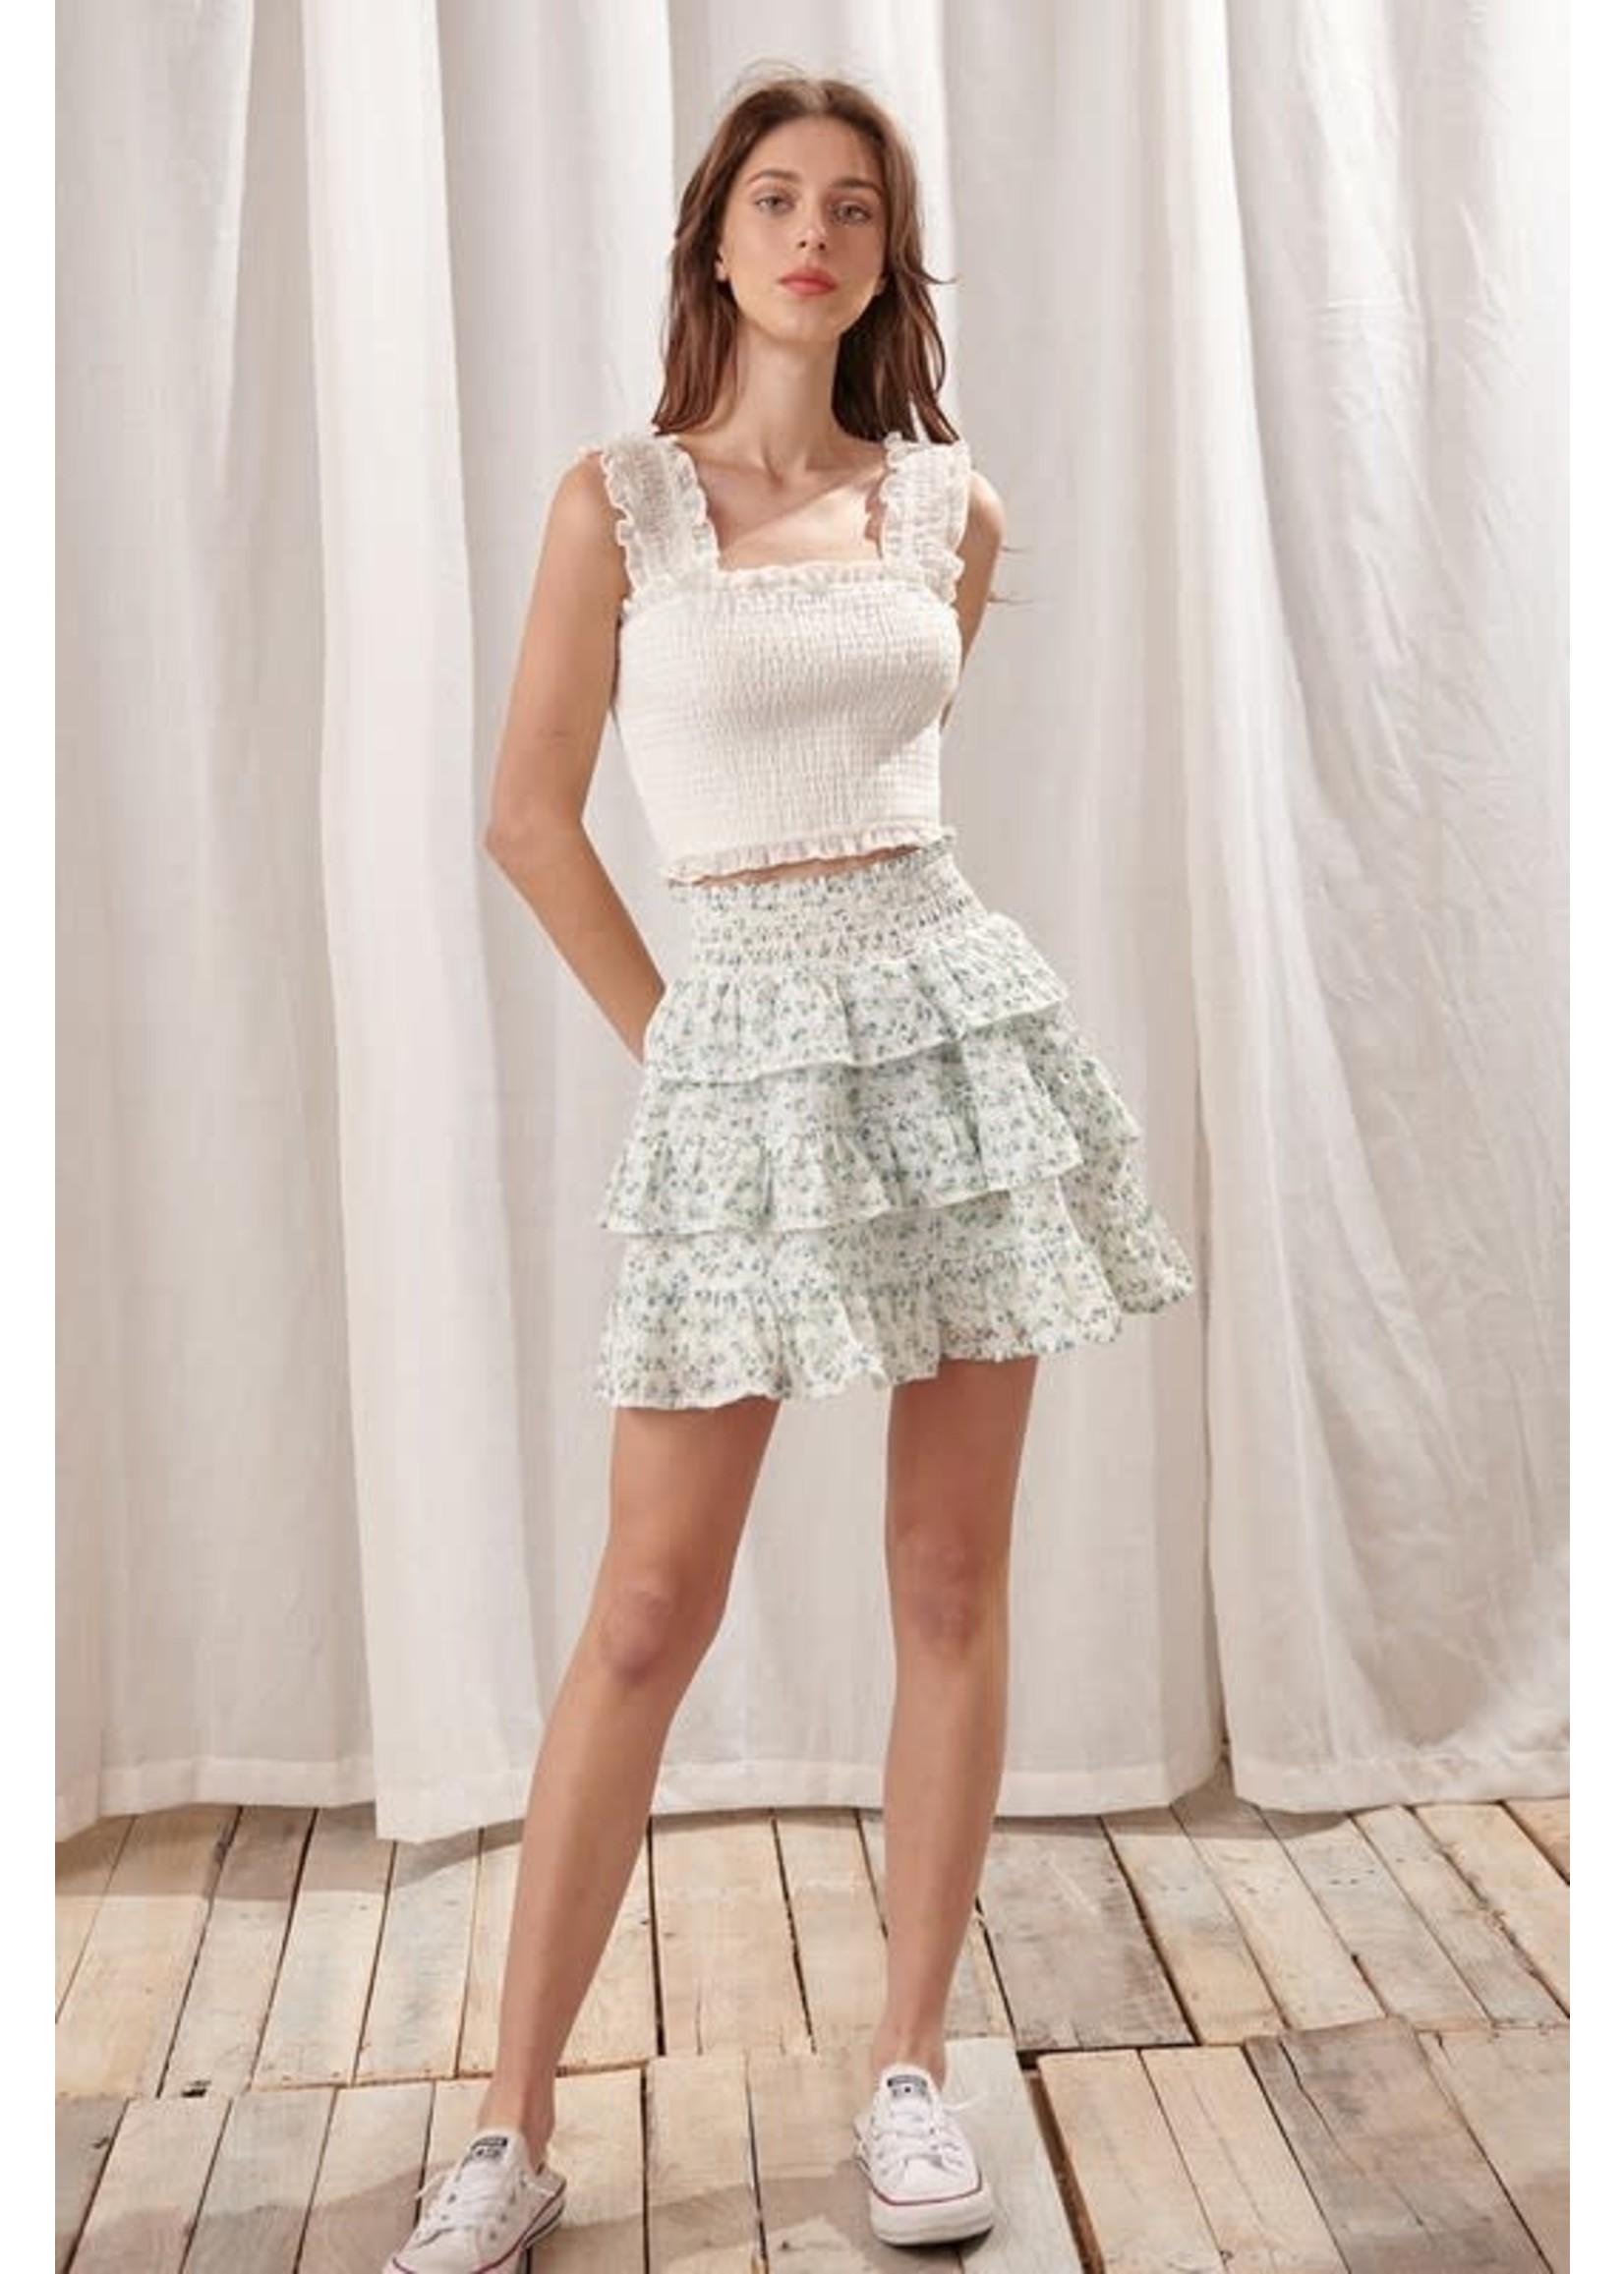 Storia Floral Eyelet Mini Skirt - SS2683